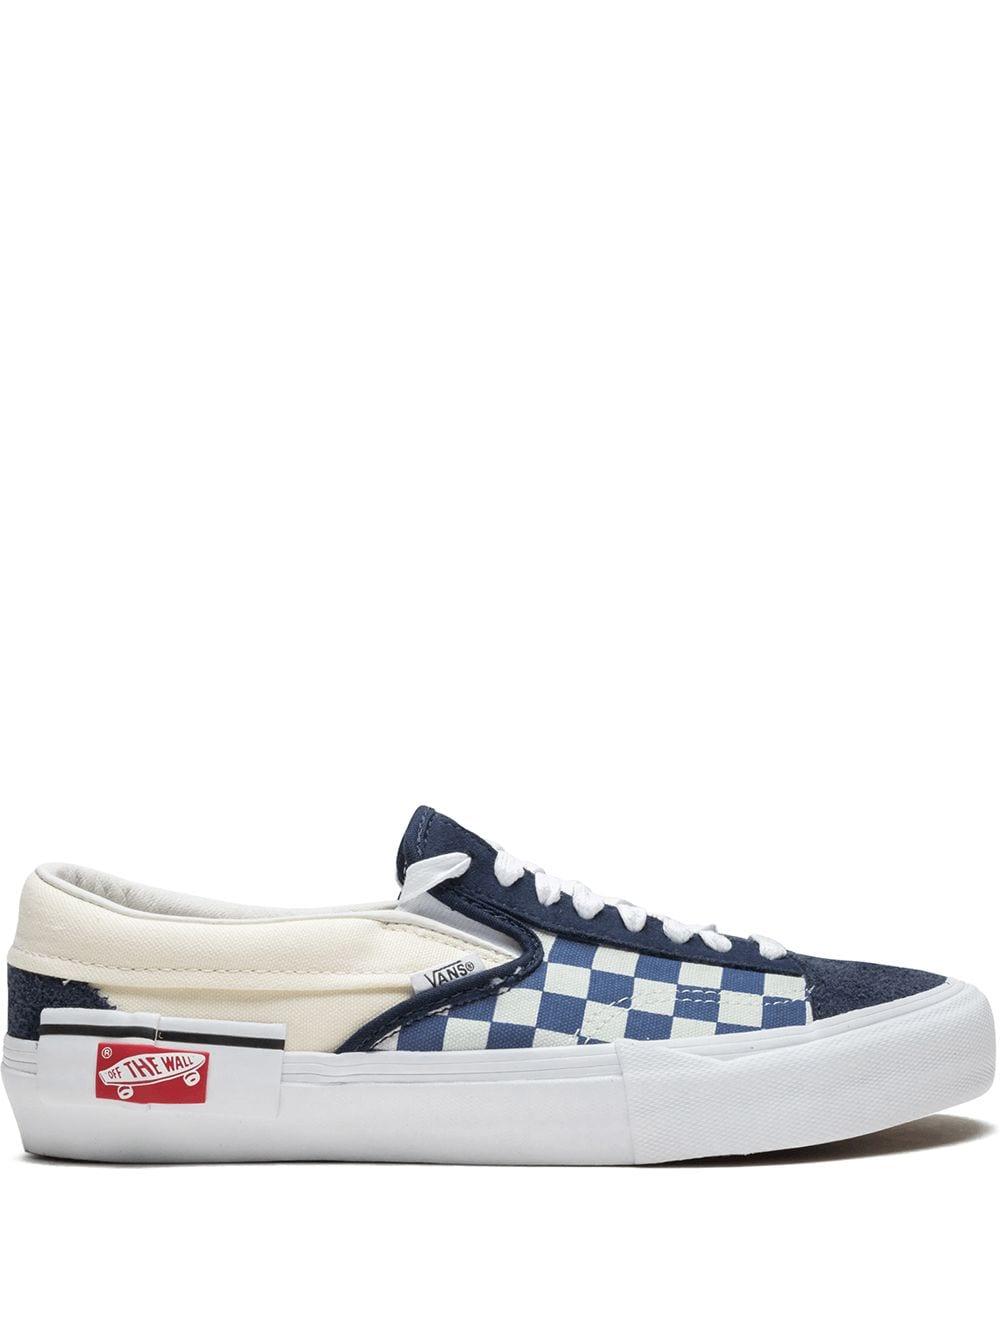 Vans Shoes UA Style 205 Dipped Dress BlueTrue White